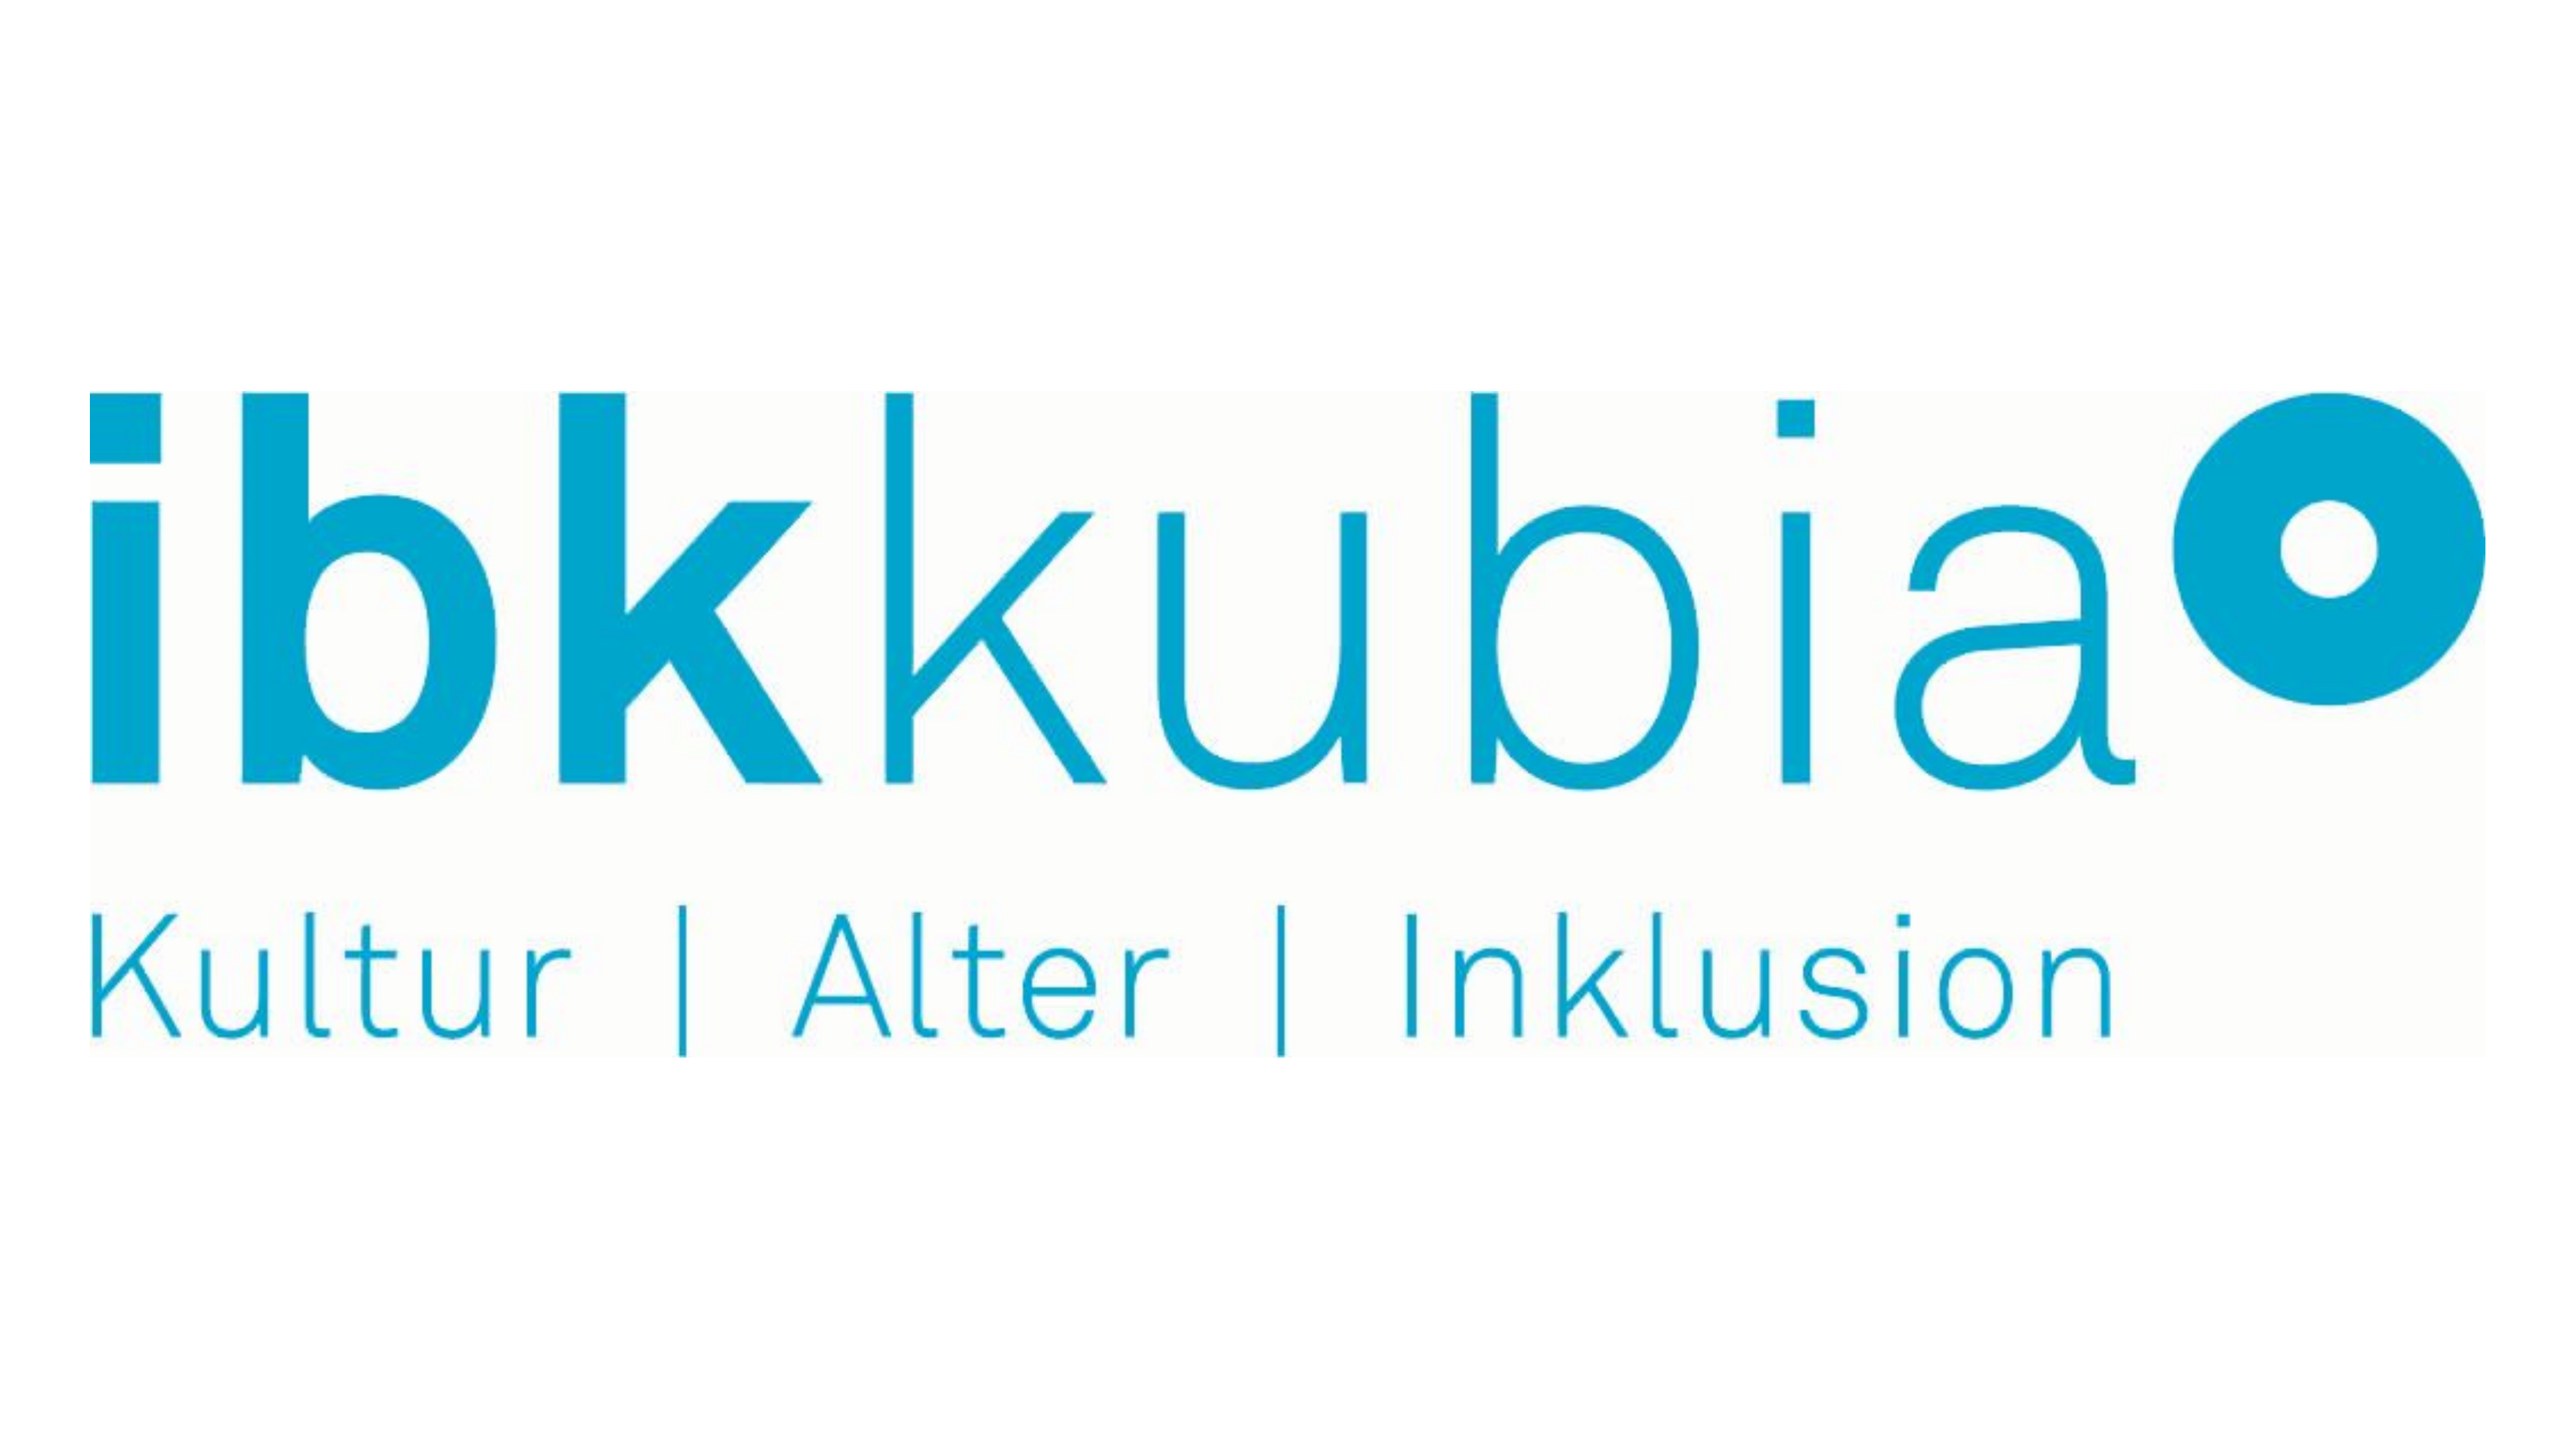 IBK Kubia - Bildung, Alter, Inklusion